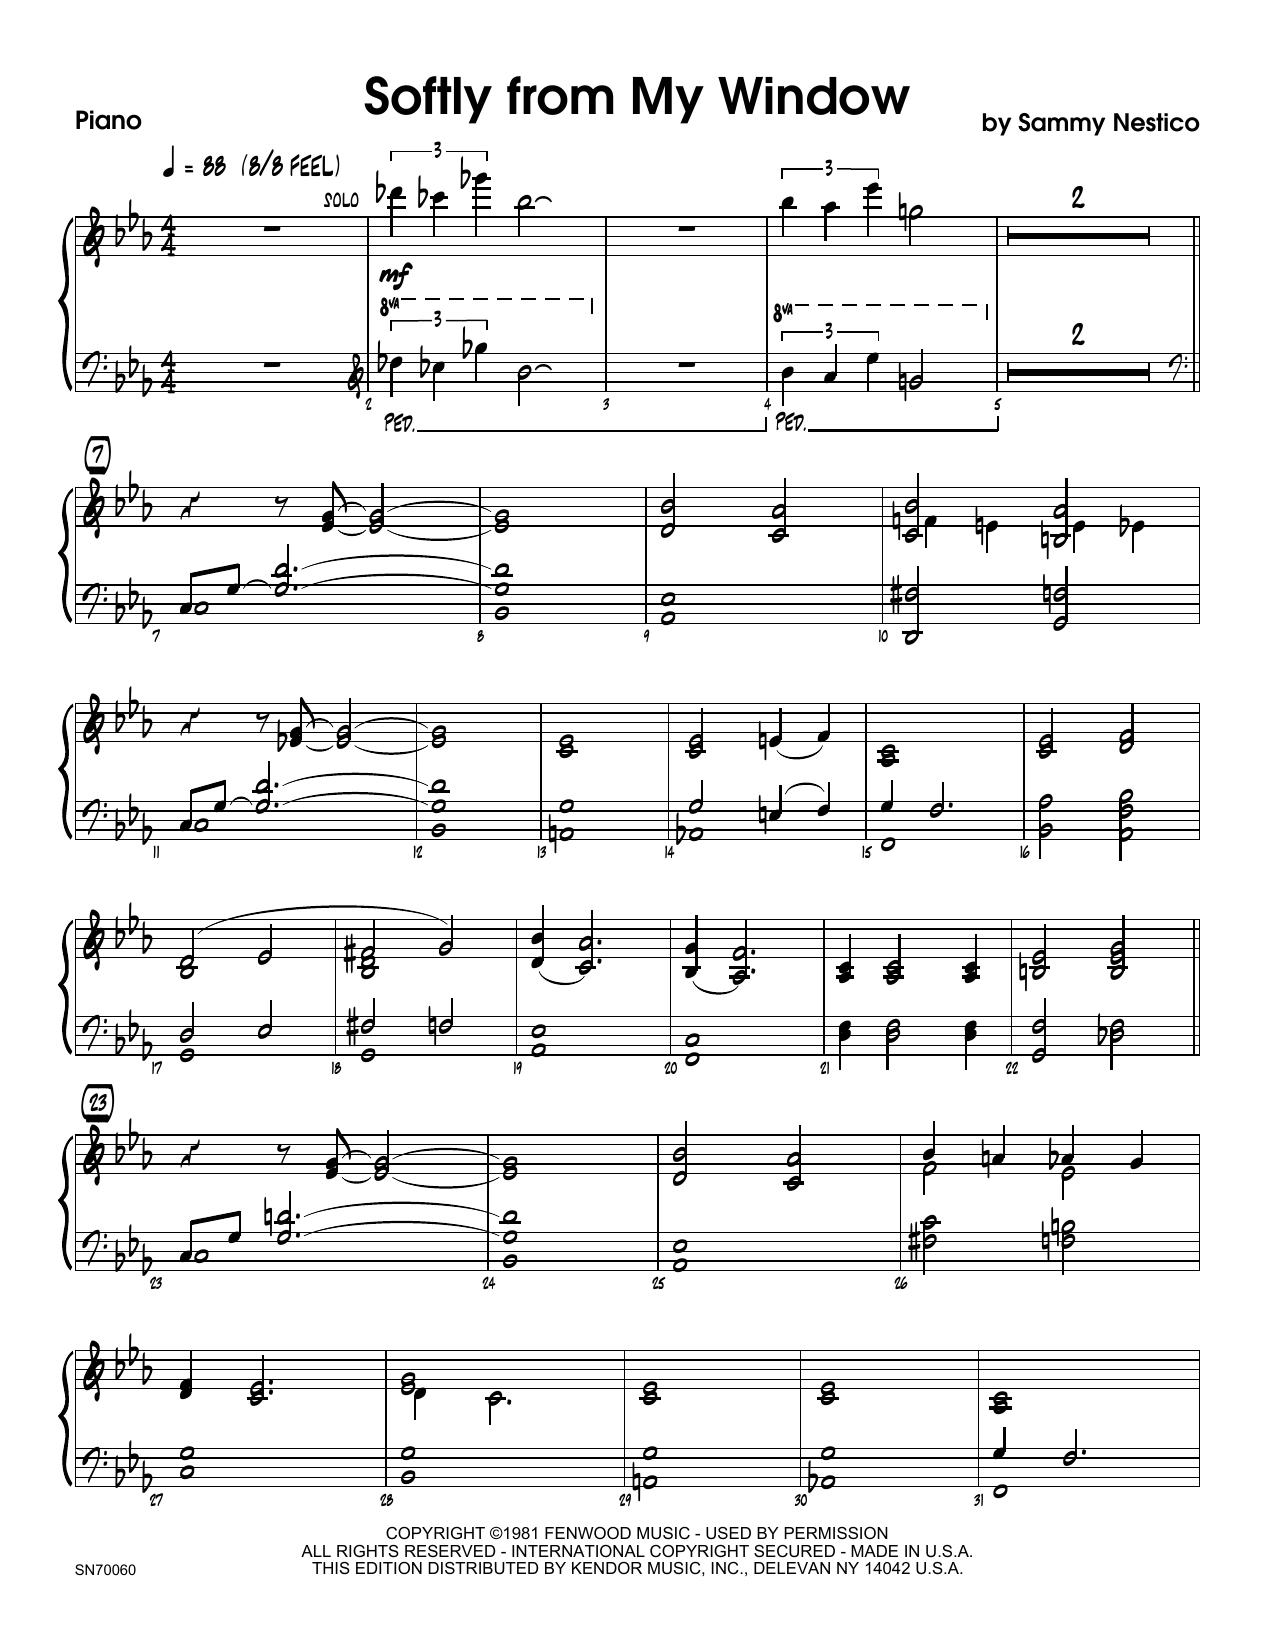 Softly From My Window - Piano Sheet Music